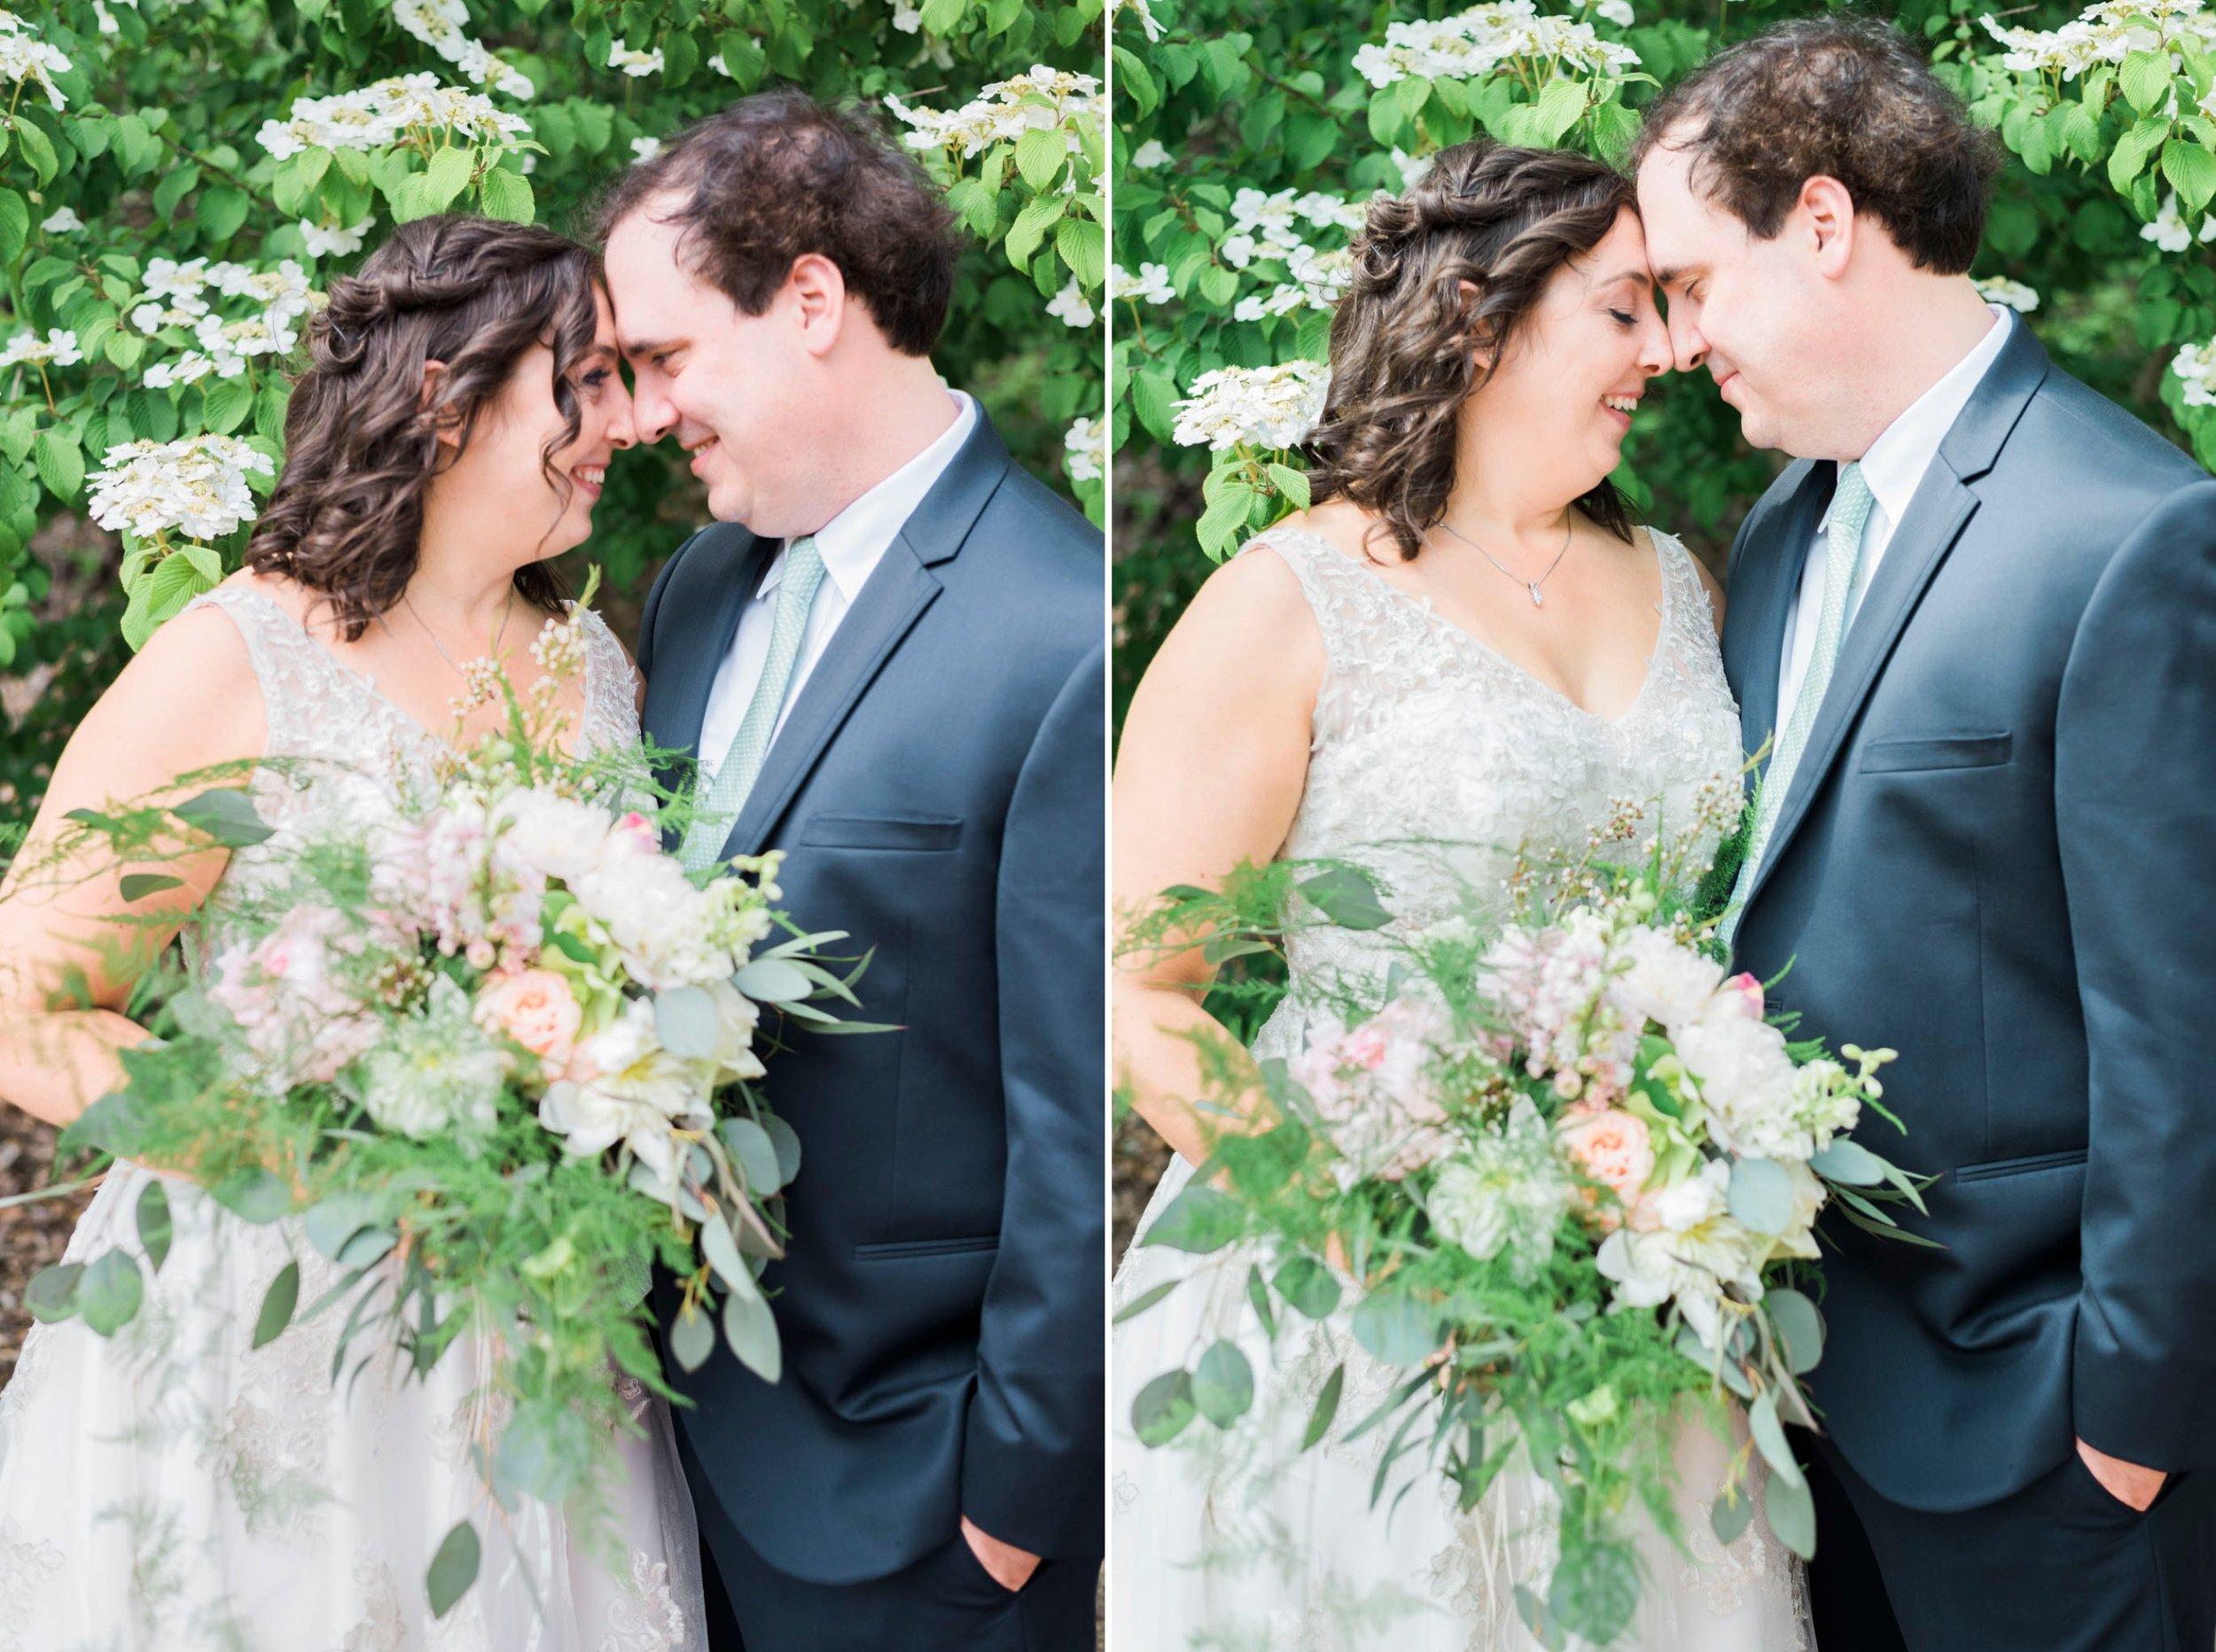 TheVirginianHotel_LynchburgVA_TheVirginianHotelWedding_Virginiaweddingphotographer_Lynchburgvawedding 20.jpg